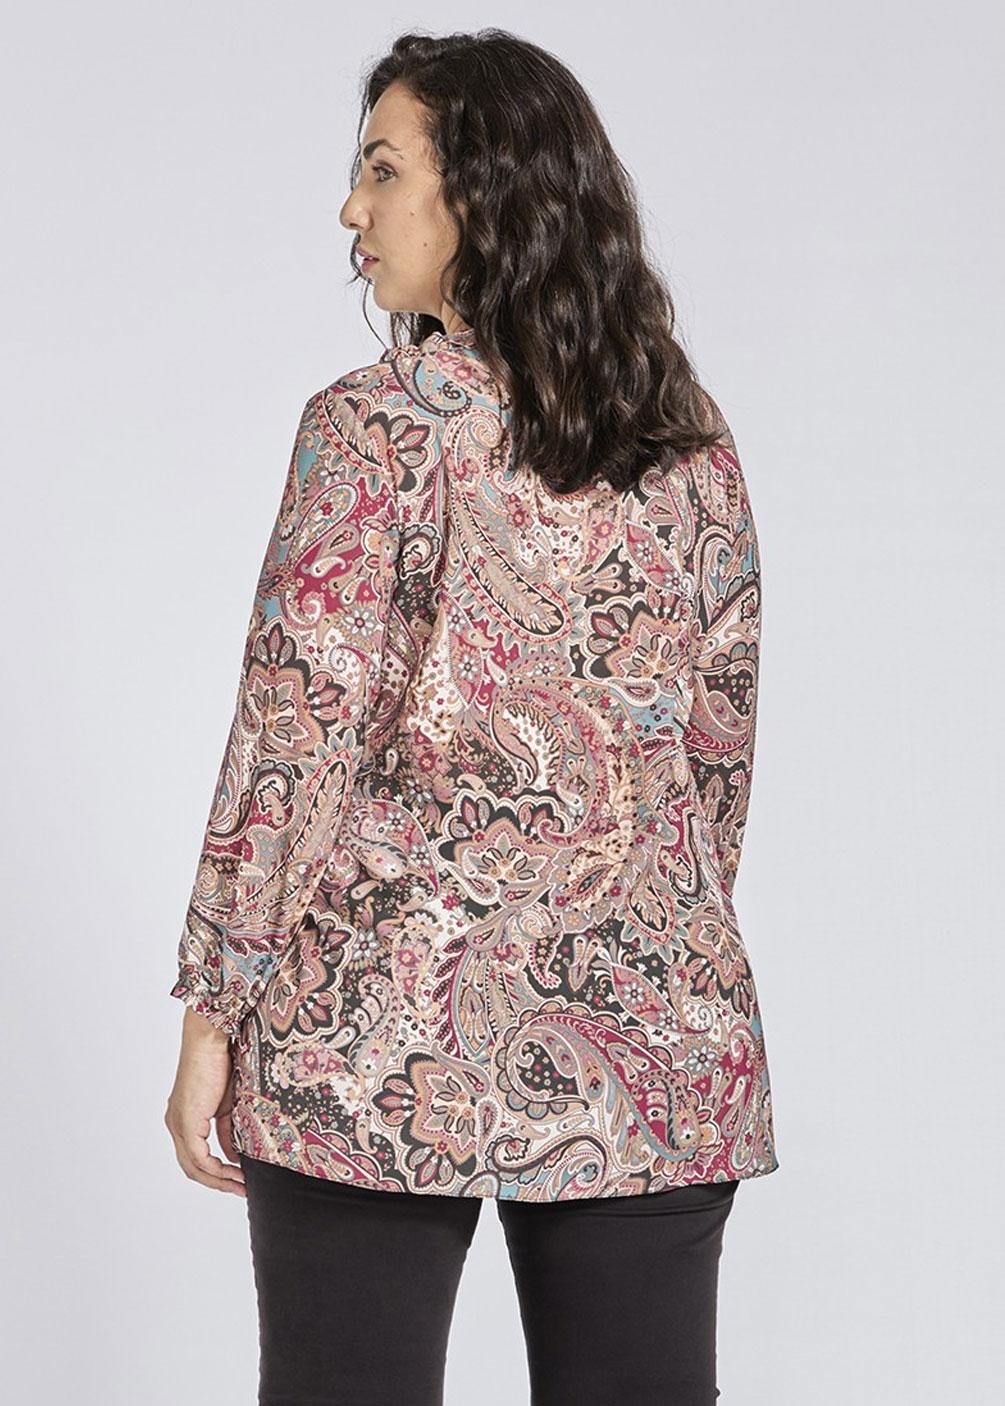 blusa camisa tallas grandes curvy spg auzu 2022